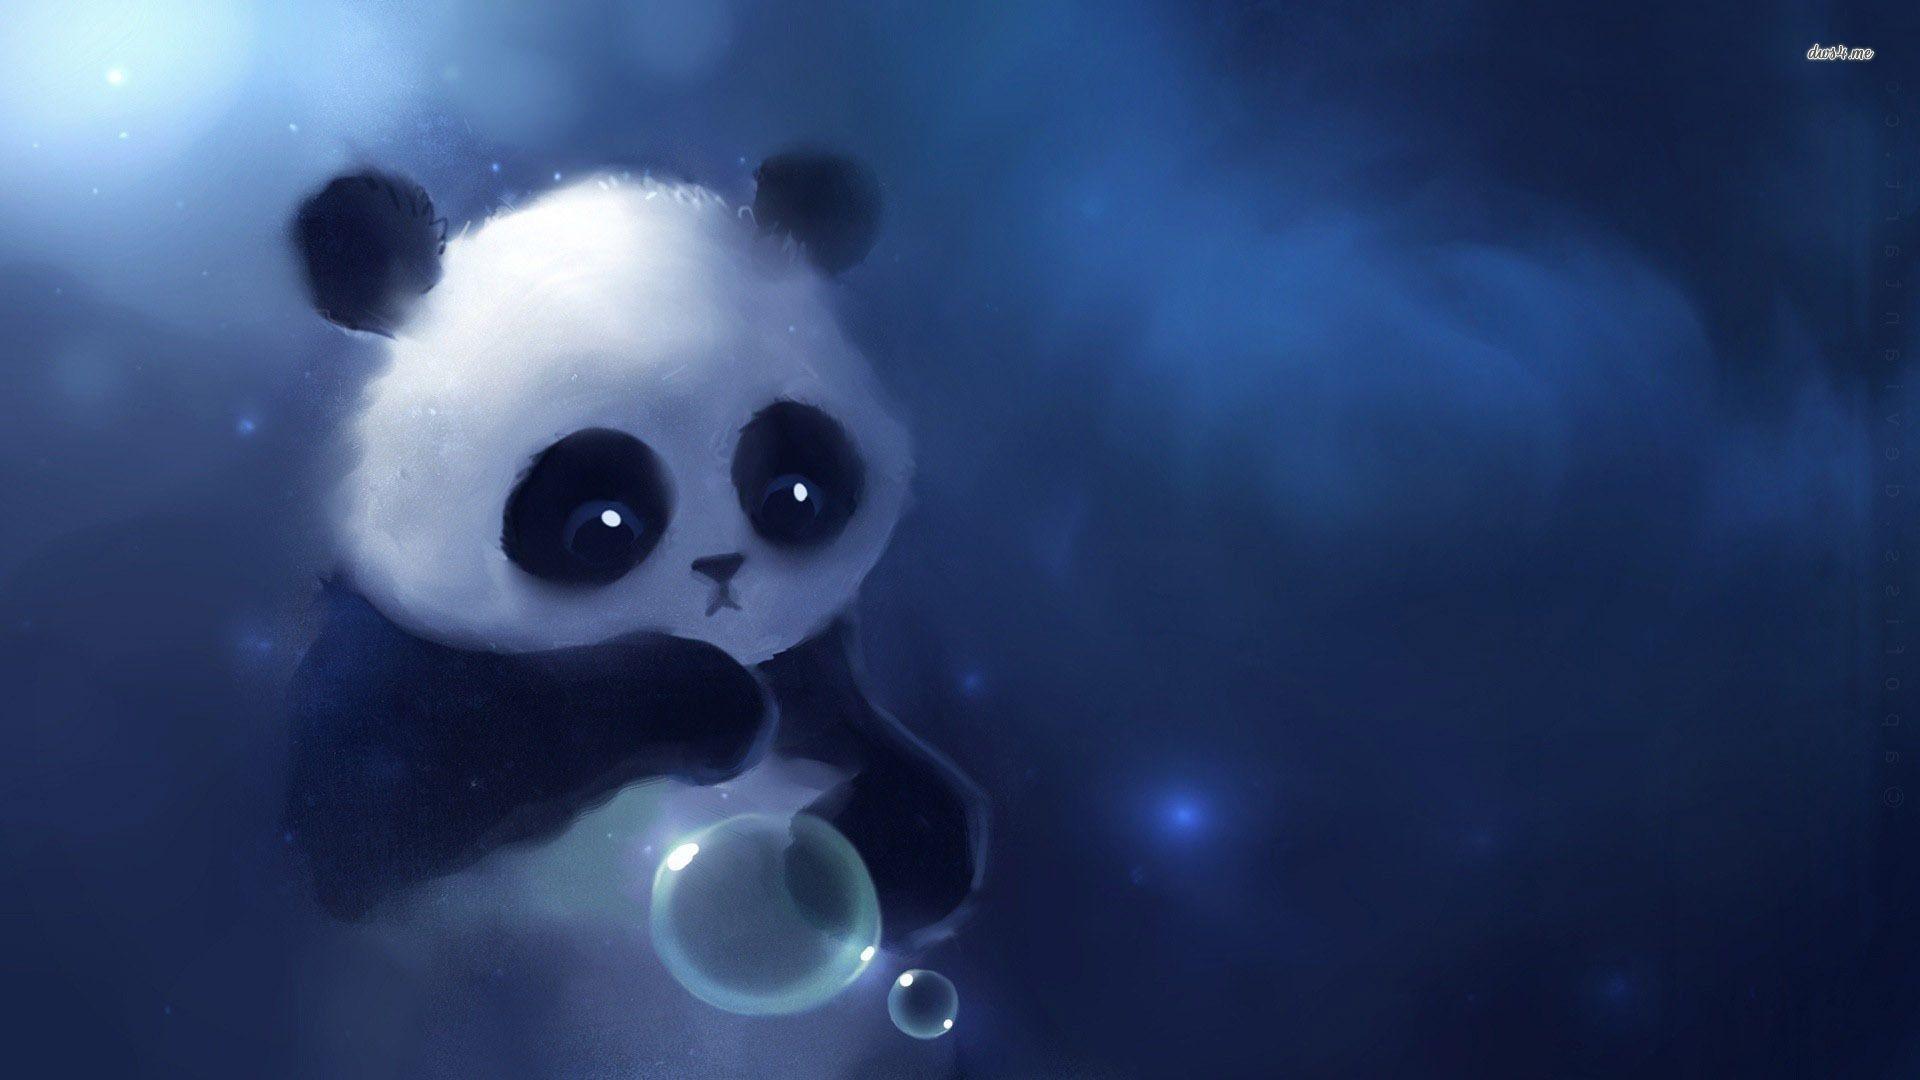 Cute Panda Background Wallpapertag